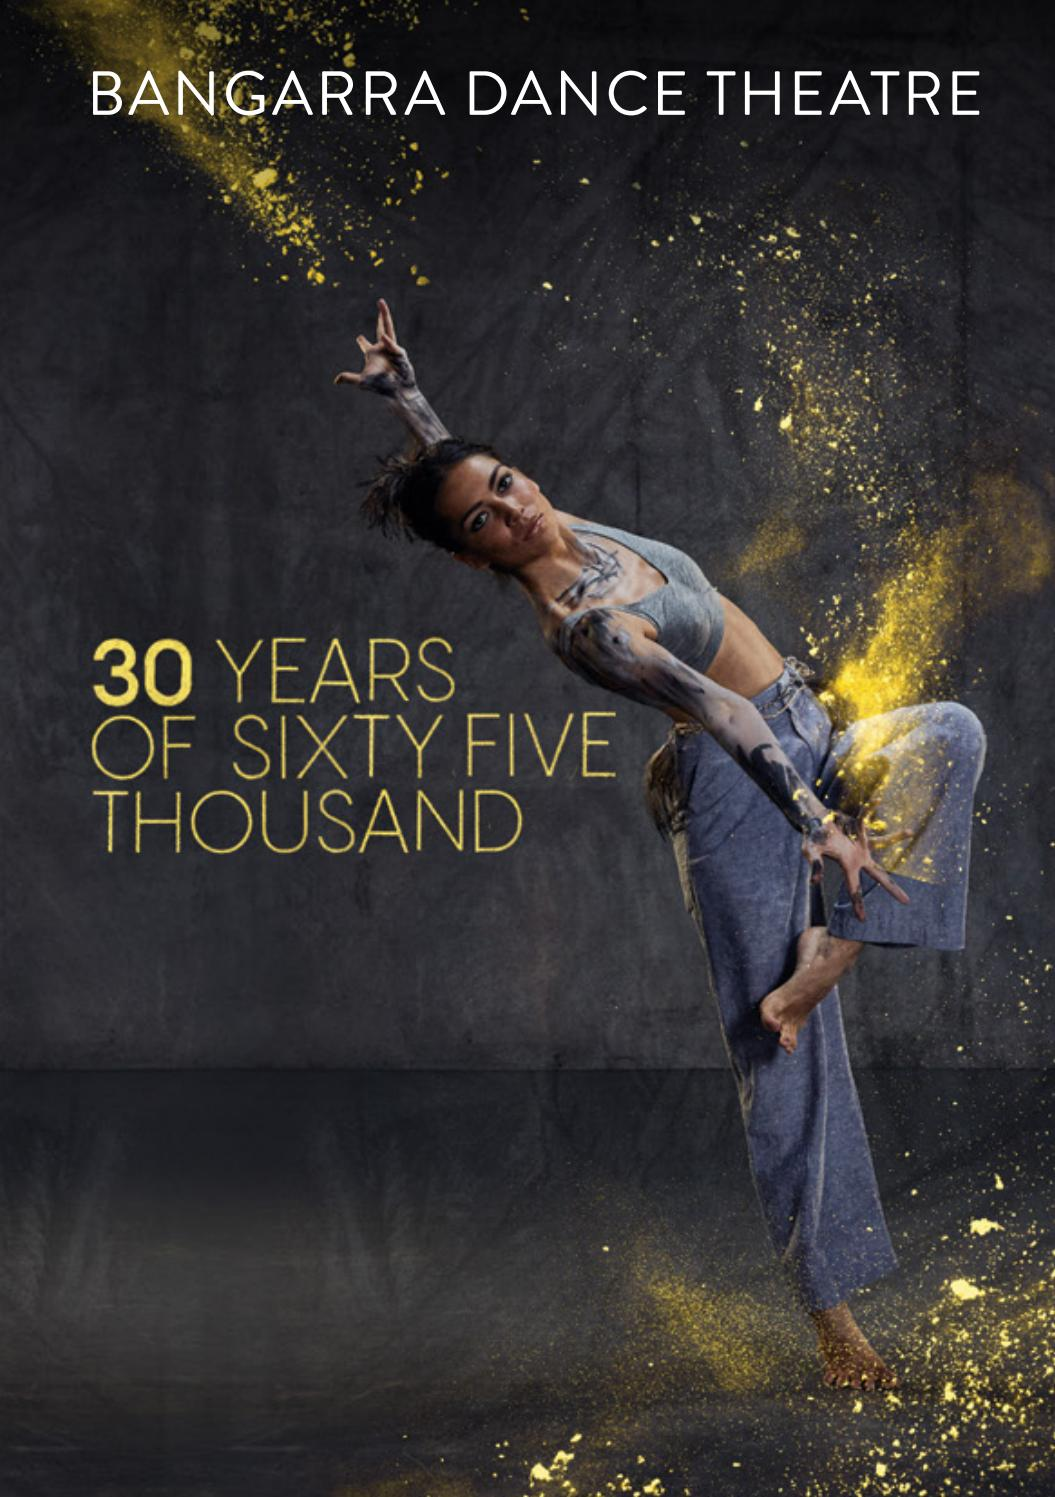 Bangarra: 30 years of sixty five thousand by Bangarra Dance